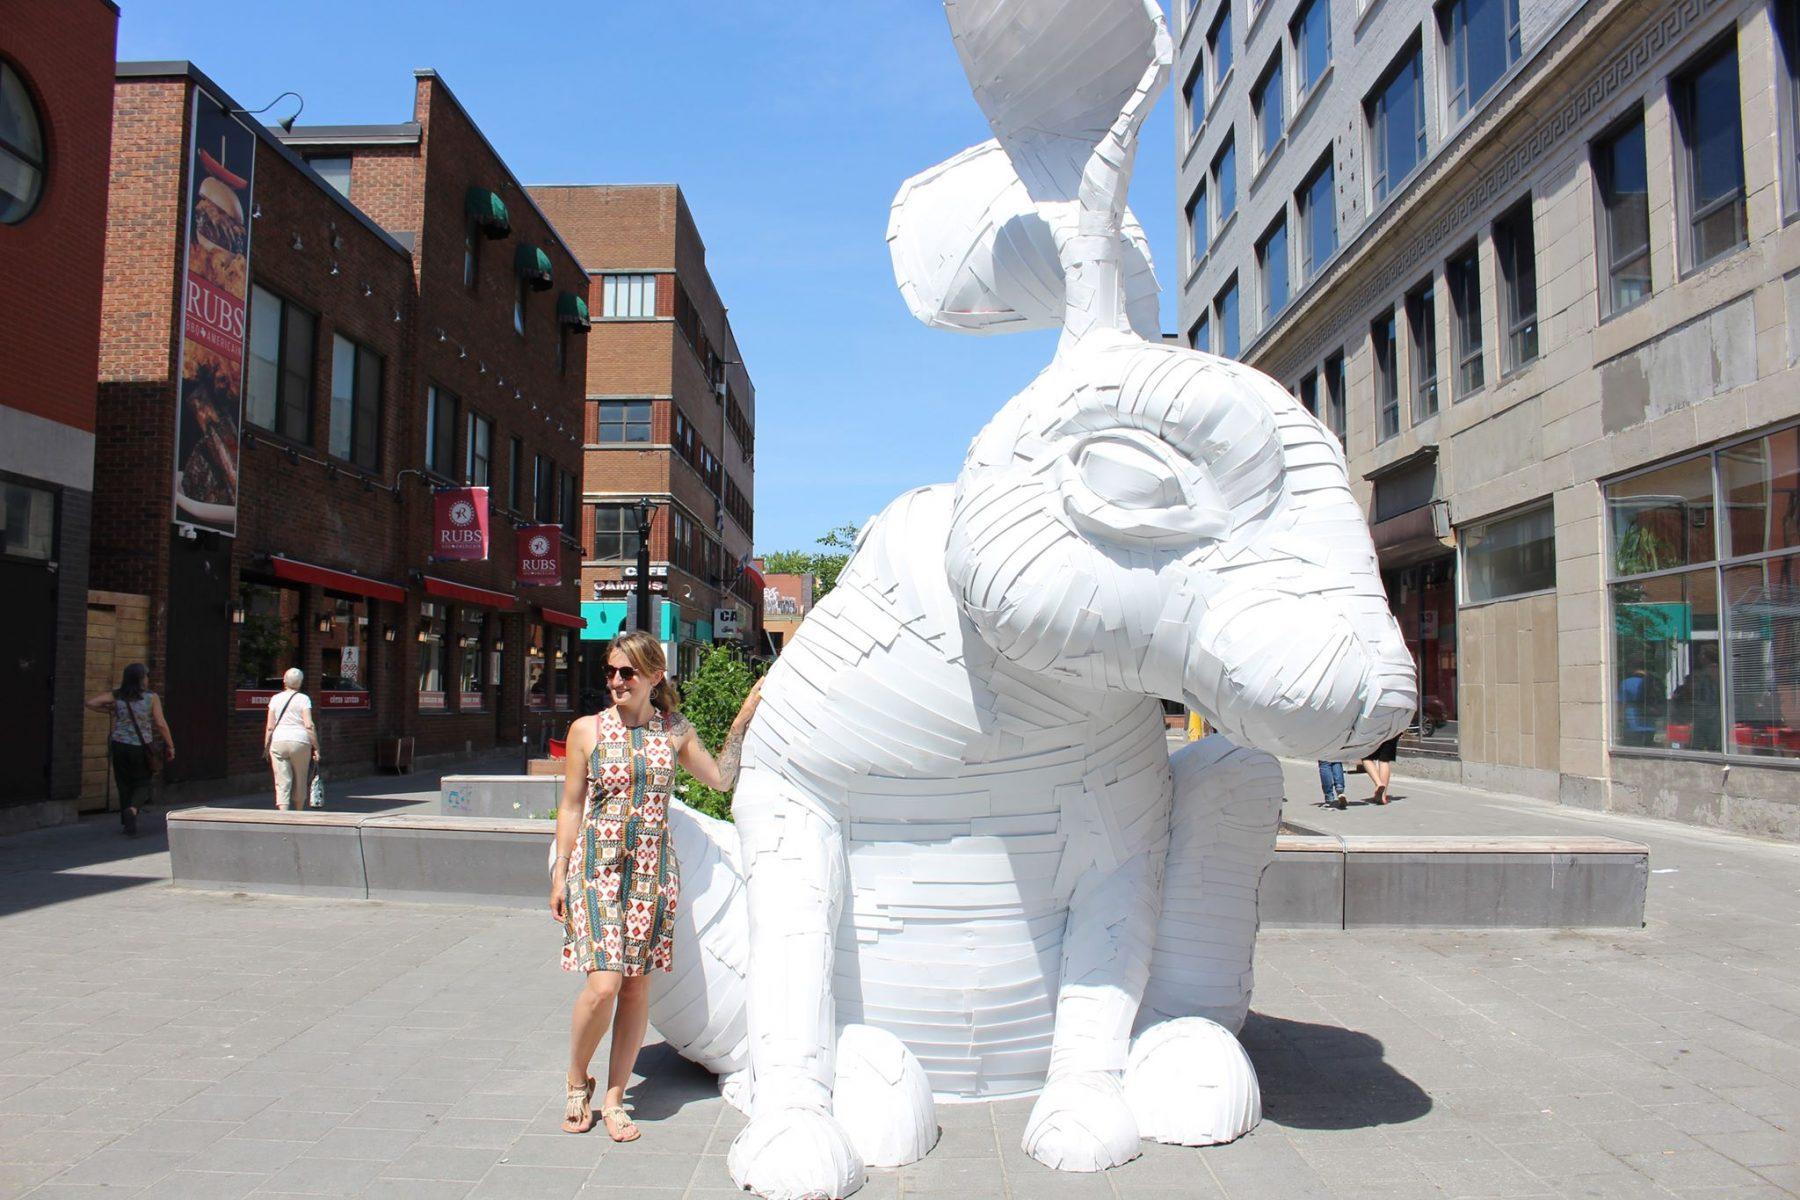 mural-festival-arts-huge-bunny-montreal